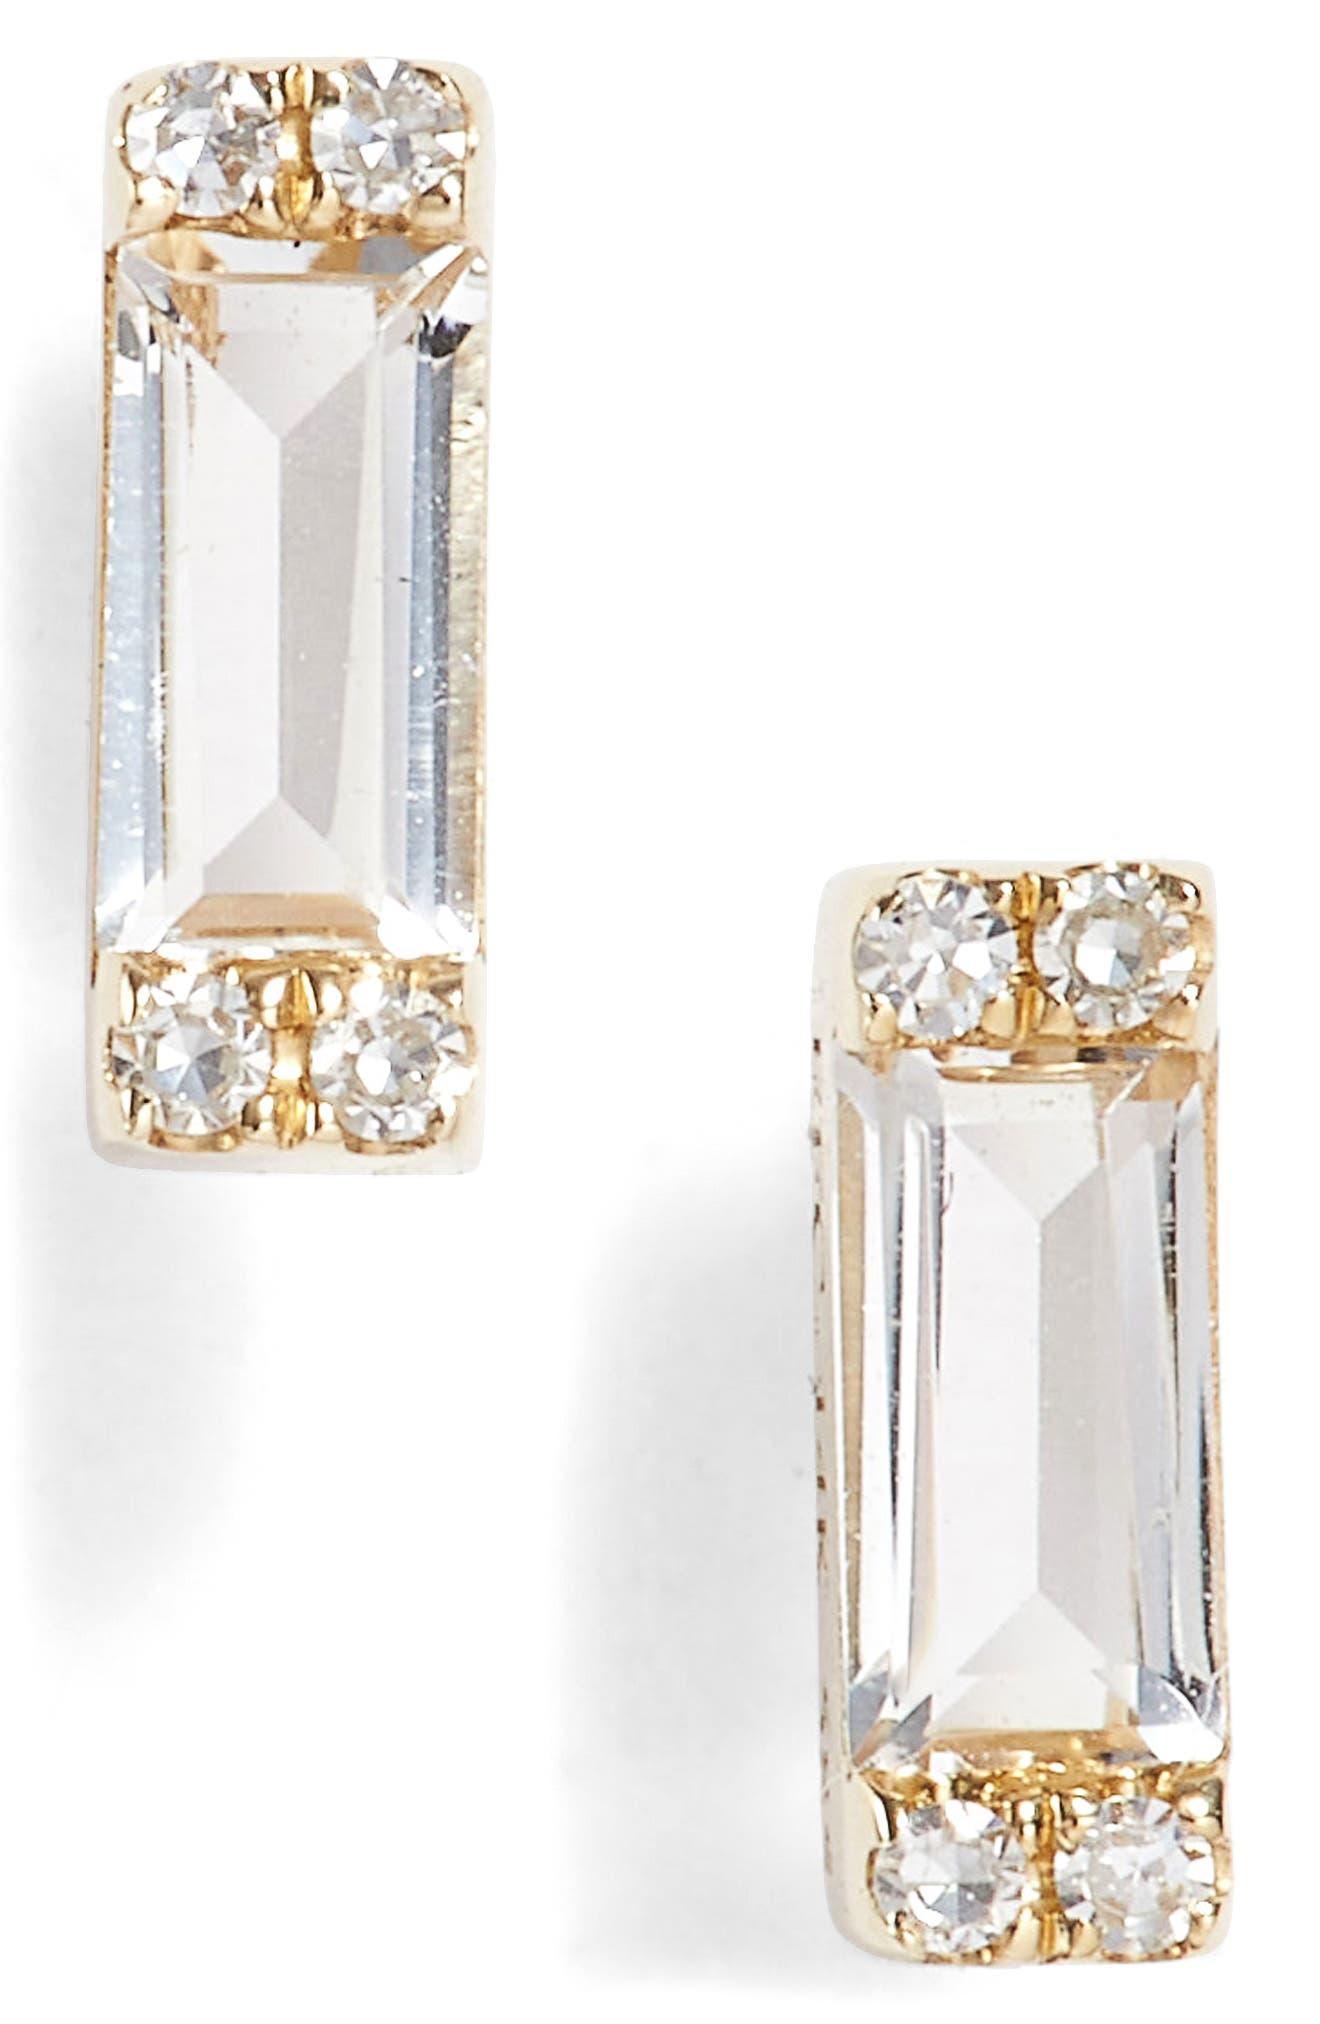 Diamond & Topaz Baguette Stud Earrings,                         Main,                         color, Yellow Gold